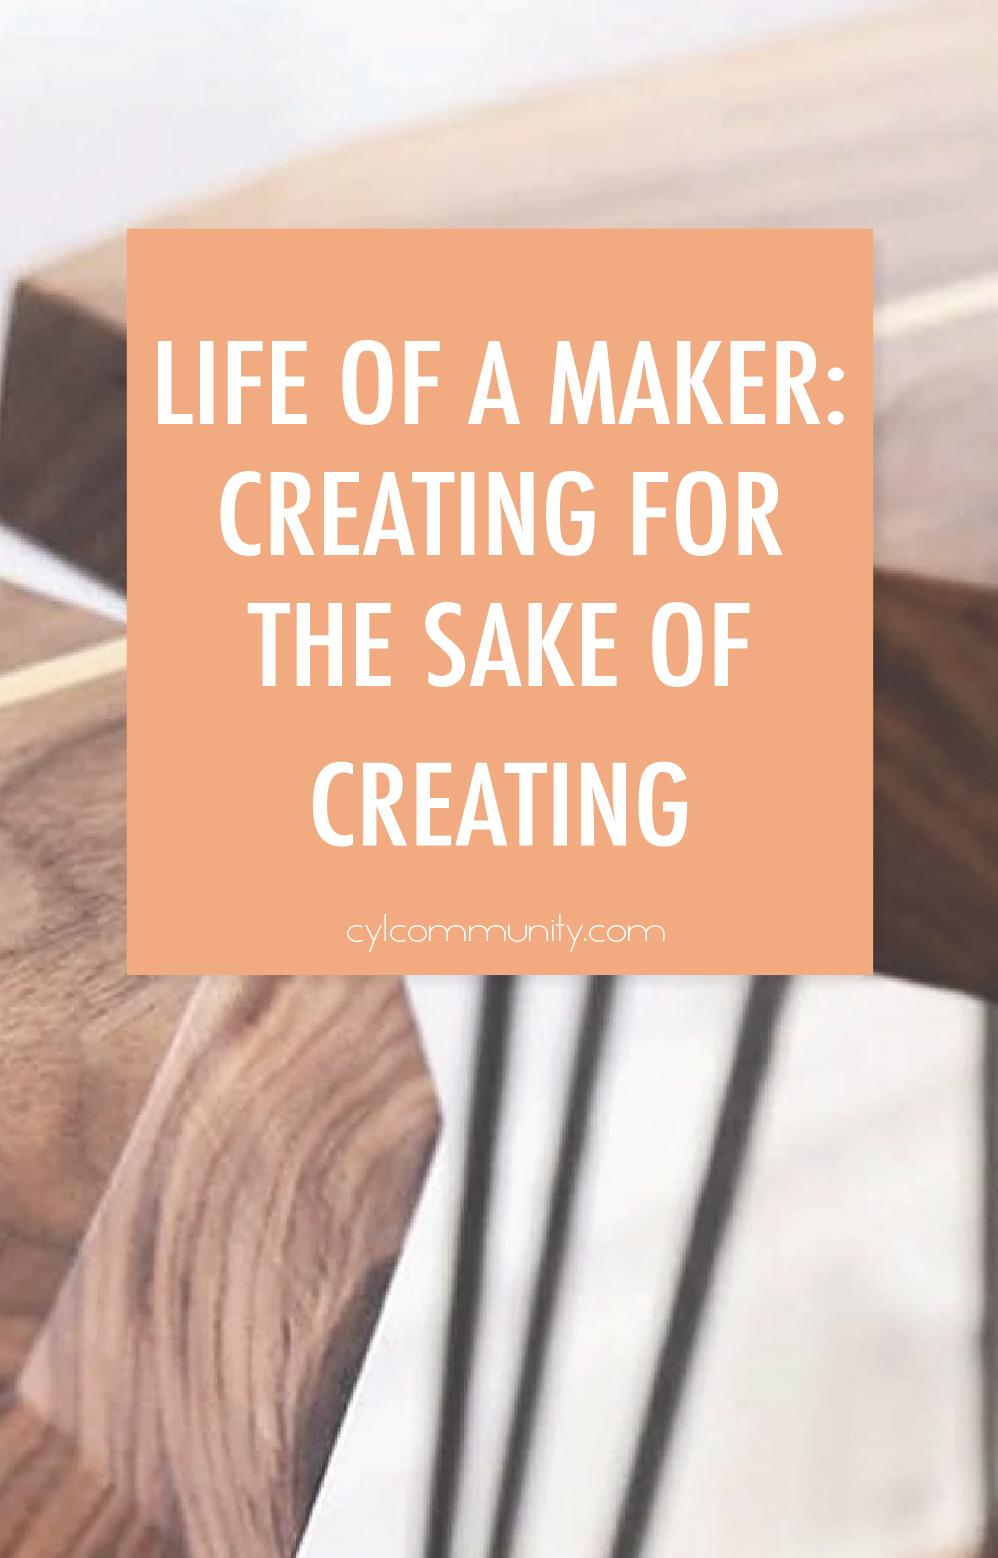 life_of_maker_creating_for_sake_creating